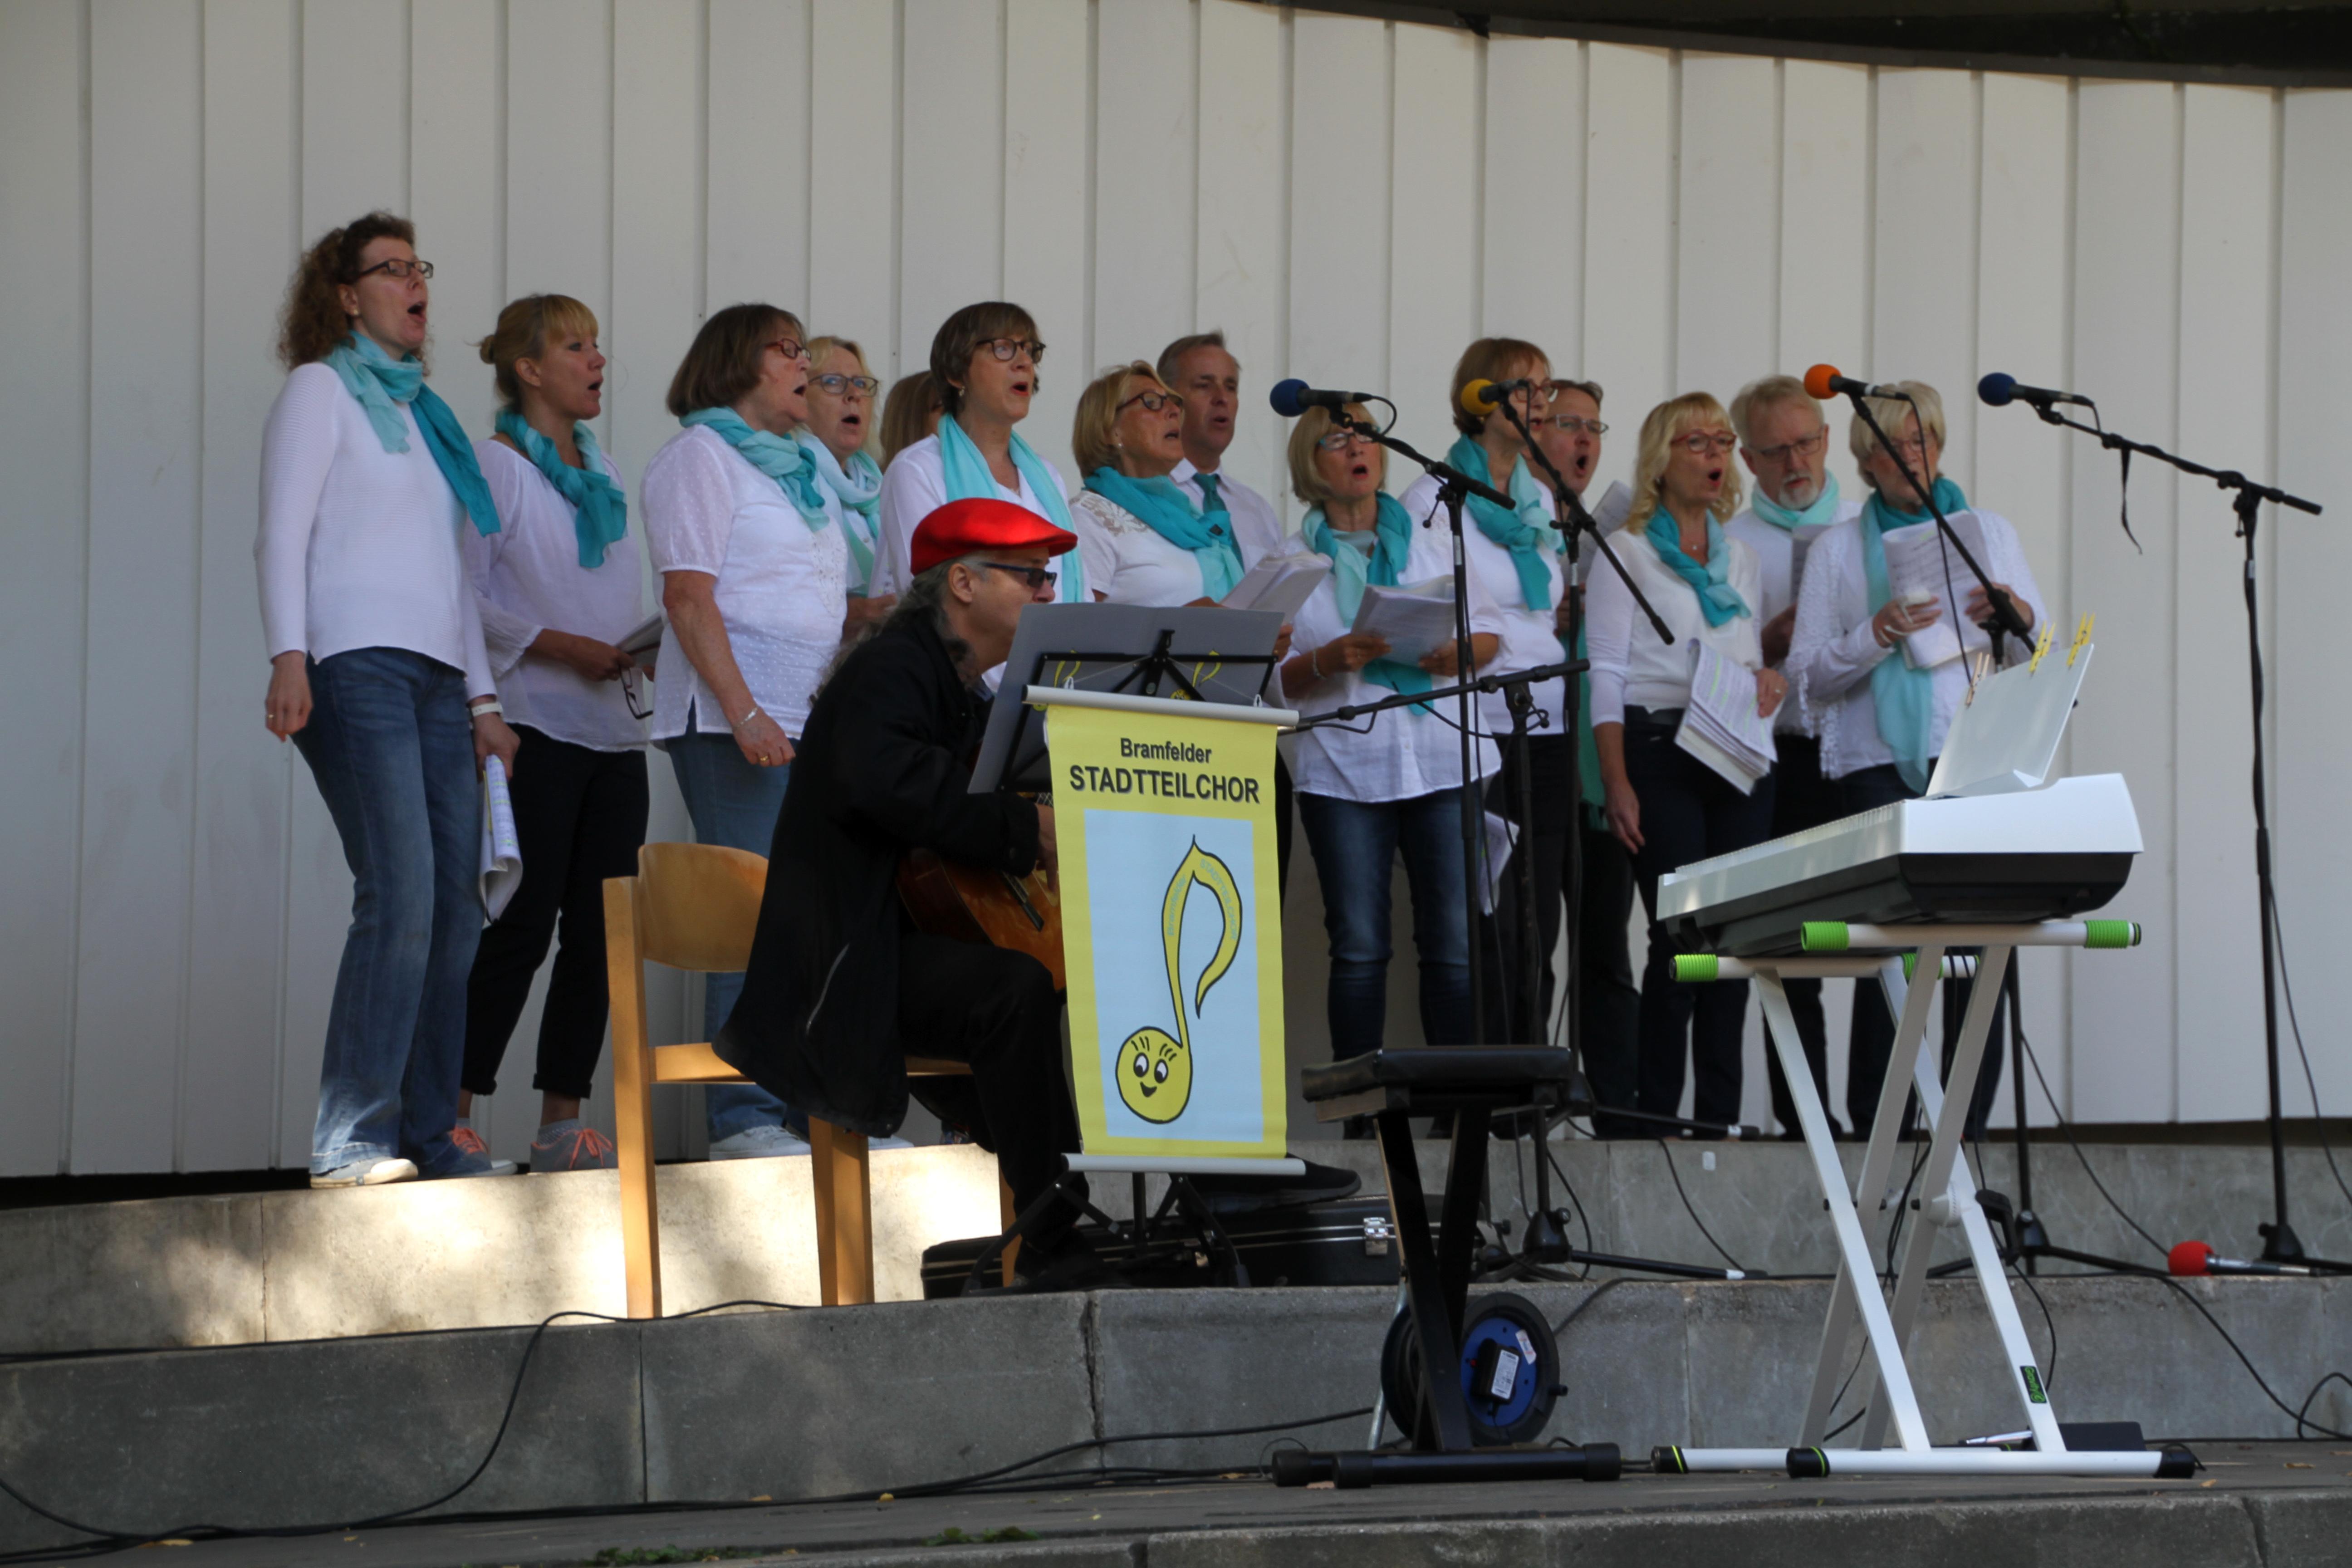 180826_Vocal_Colours_Chorfestival_14_Bramfelder_Stadtteilchor